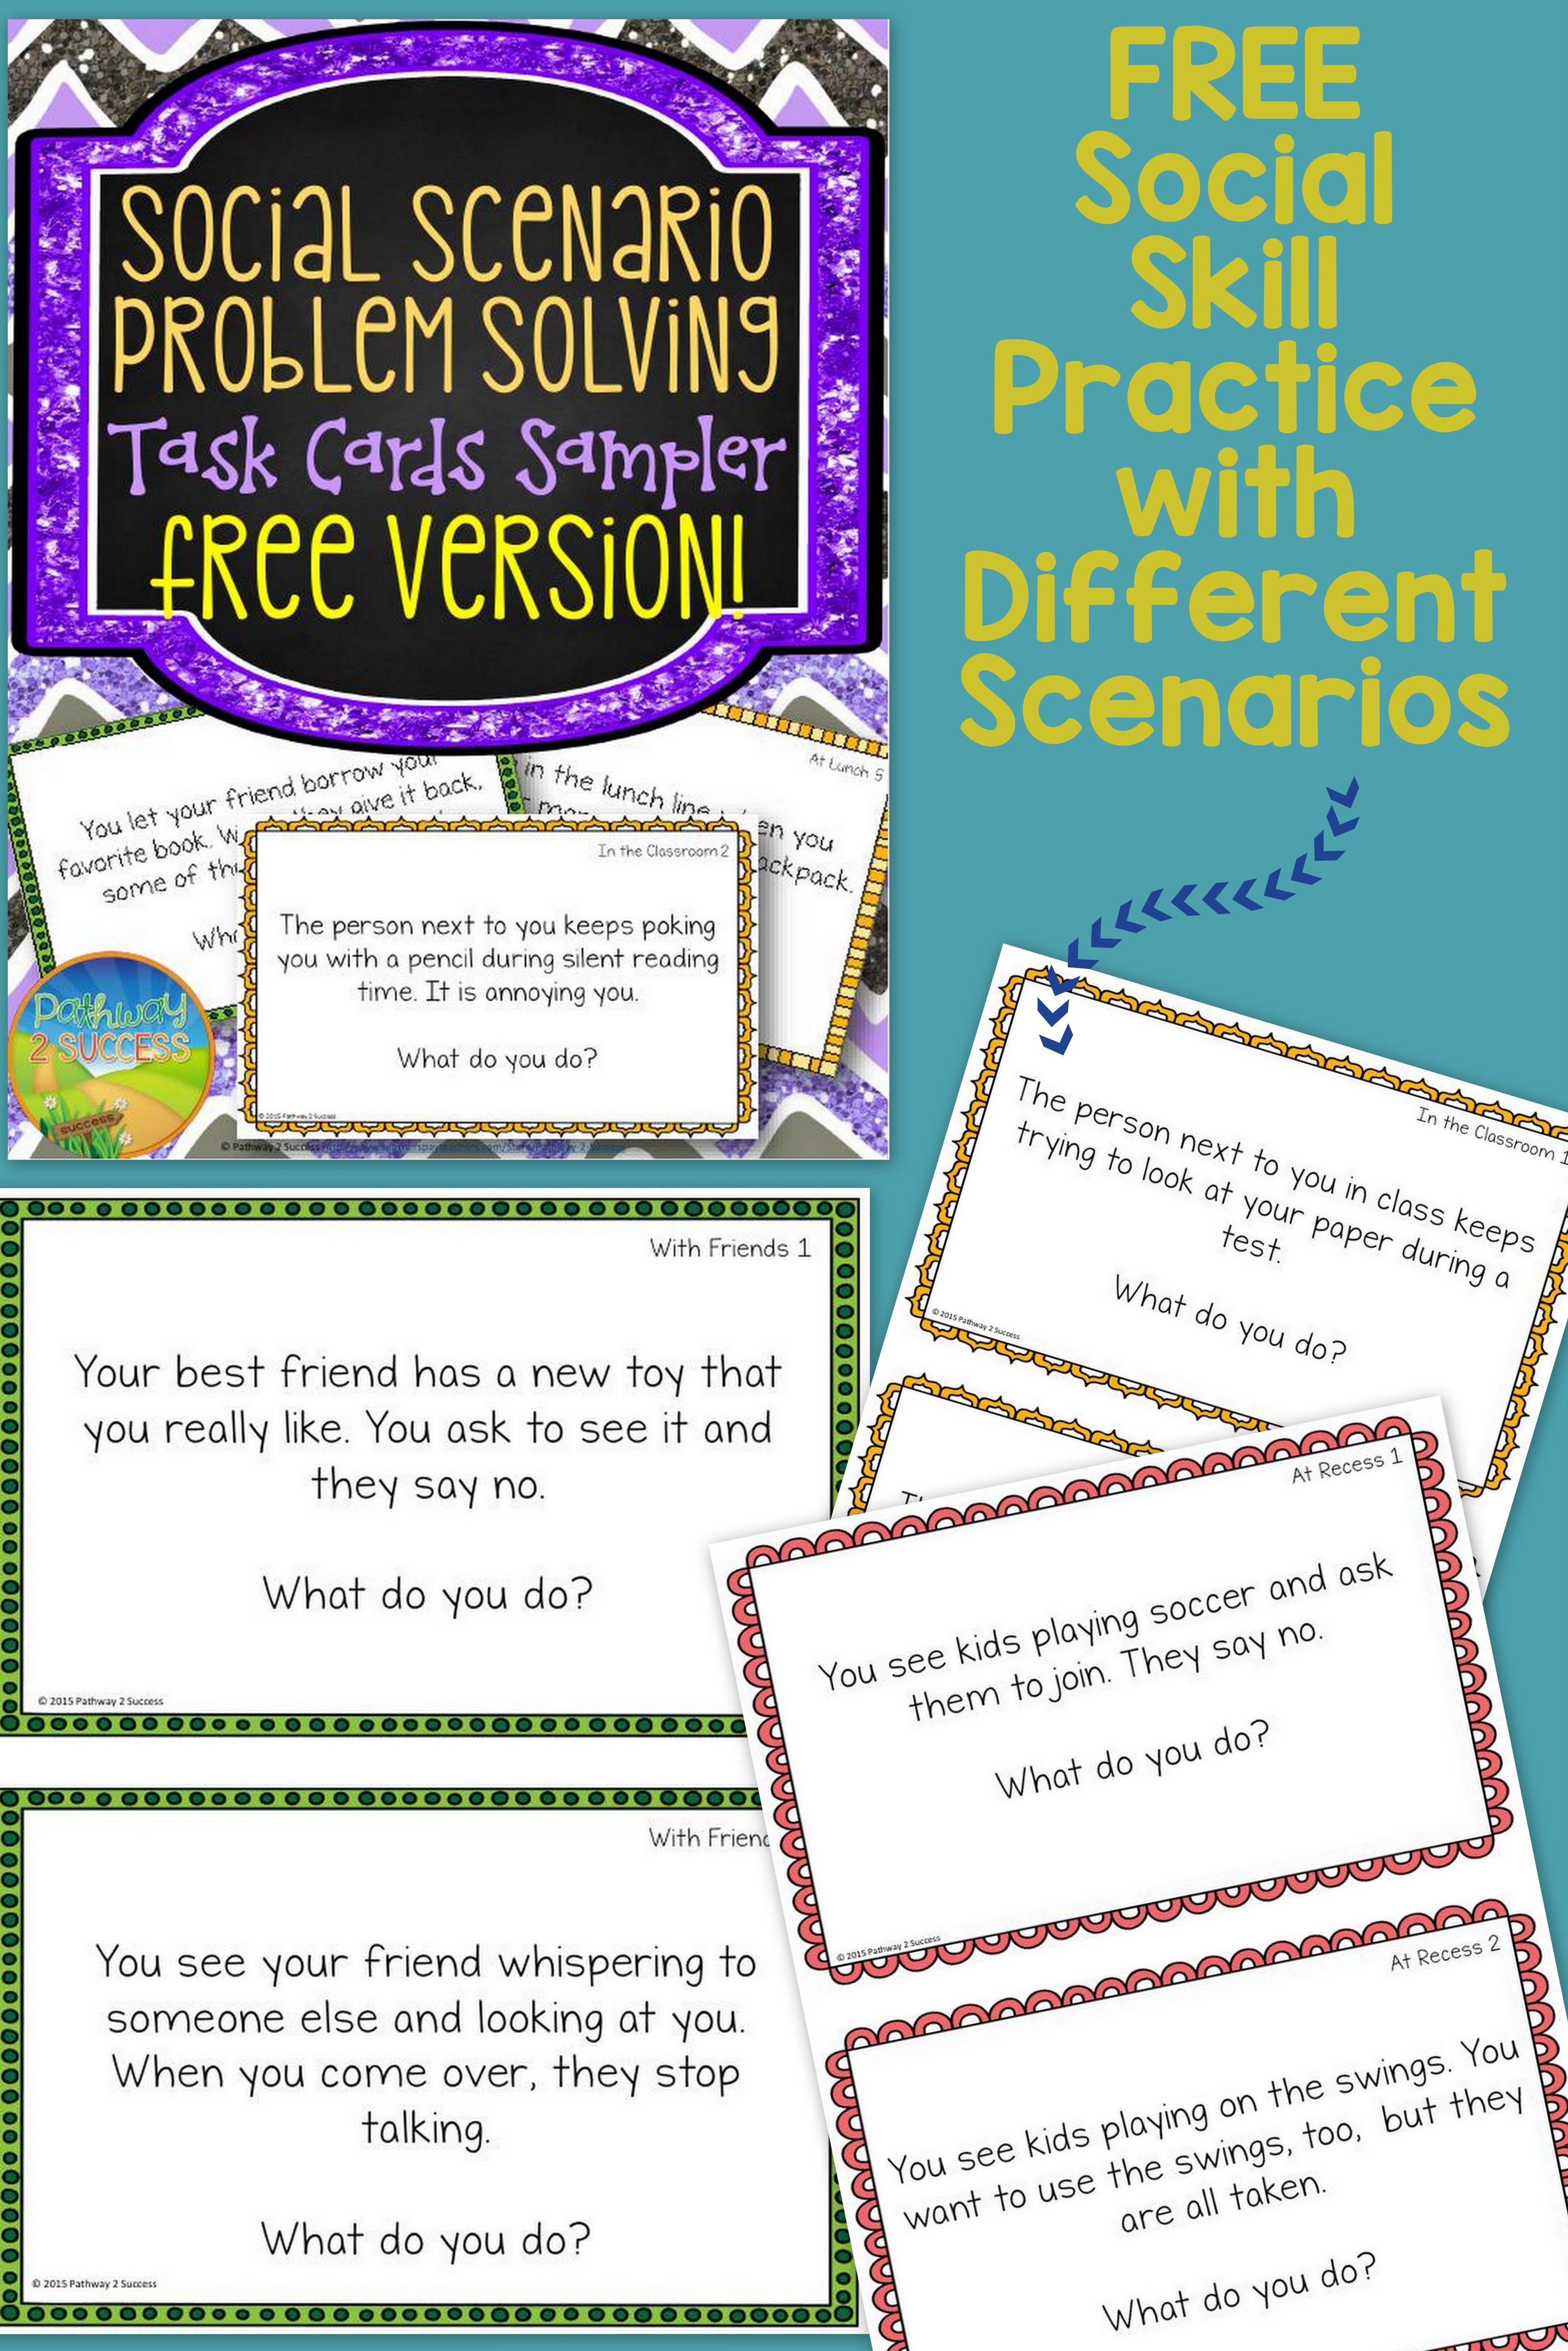 Free Social Scenario Problem Solving Sampler 10 Fun Task Cards With Different Socia Teaching Social Skills Social Emotional Learning Social Skills Activities